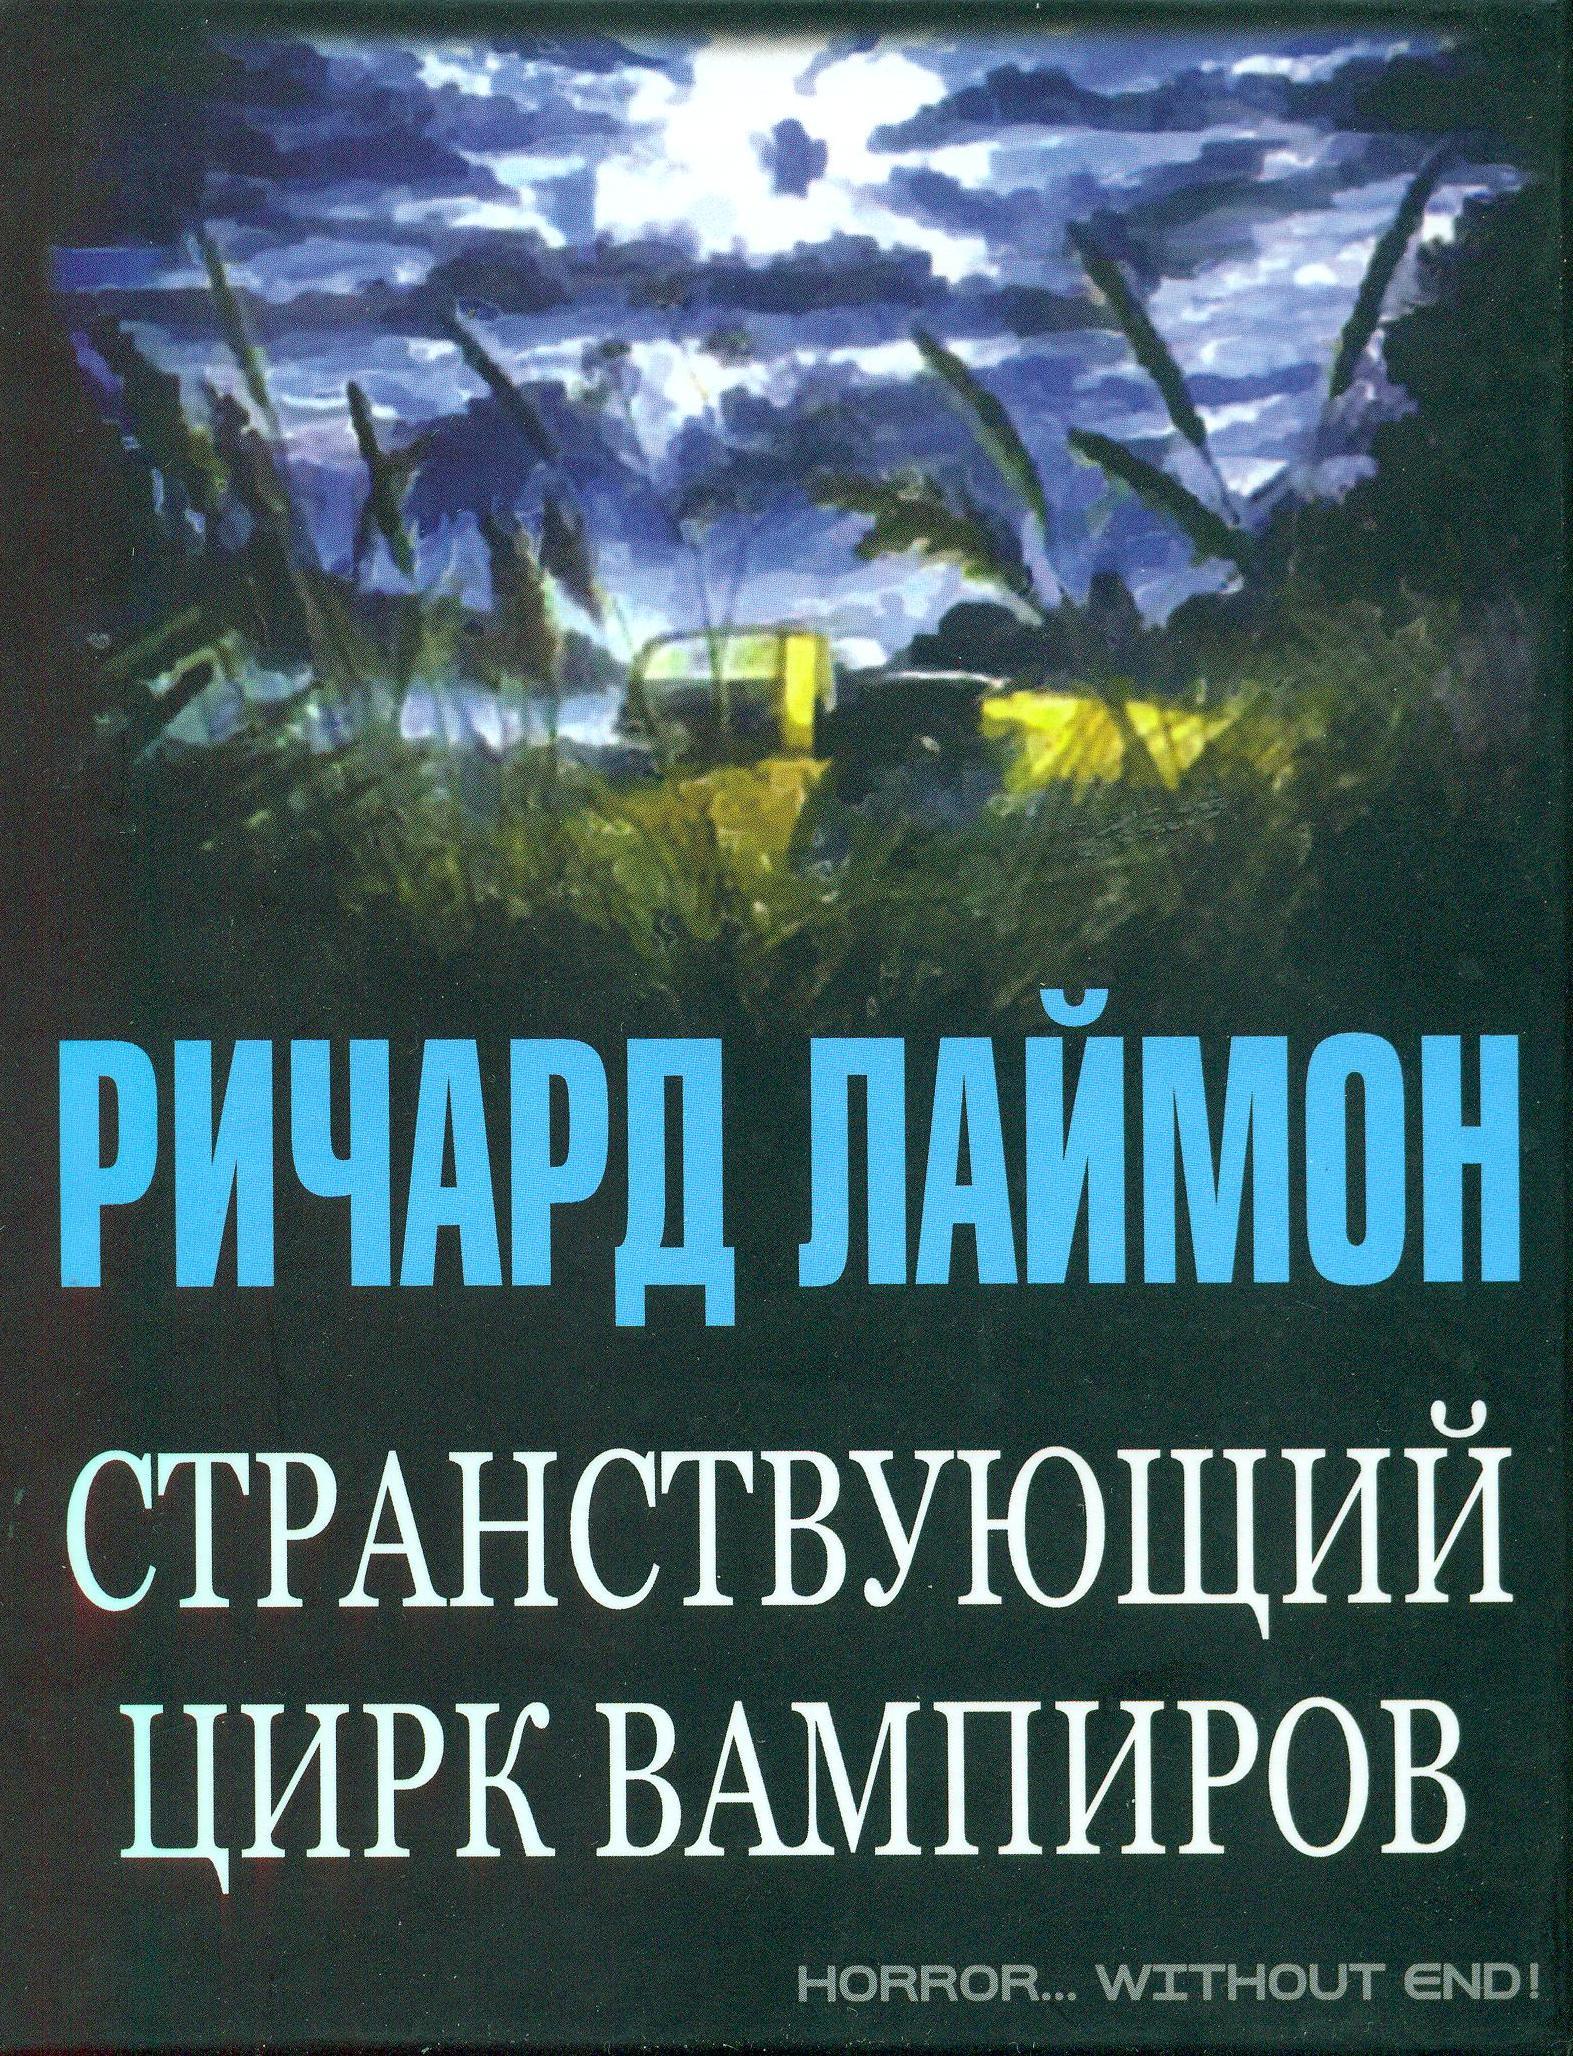 http://www.fantlab.ru/images/editions/orig/96342